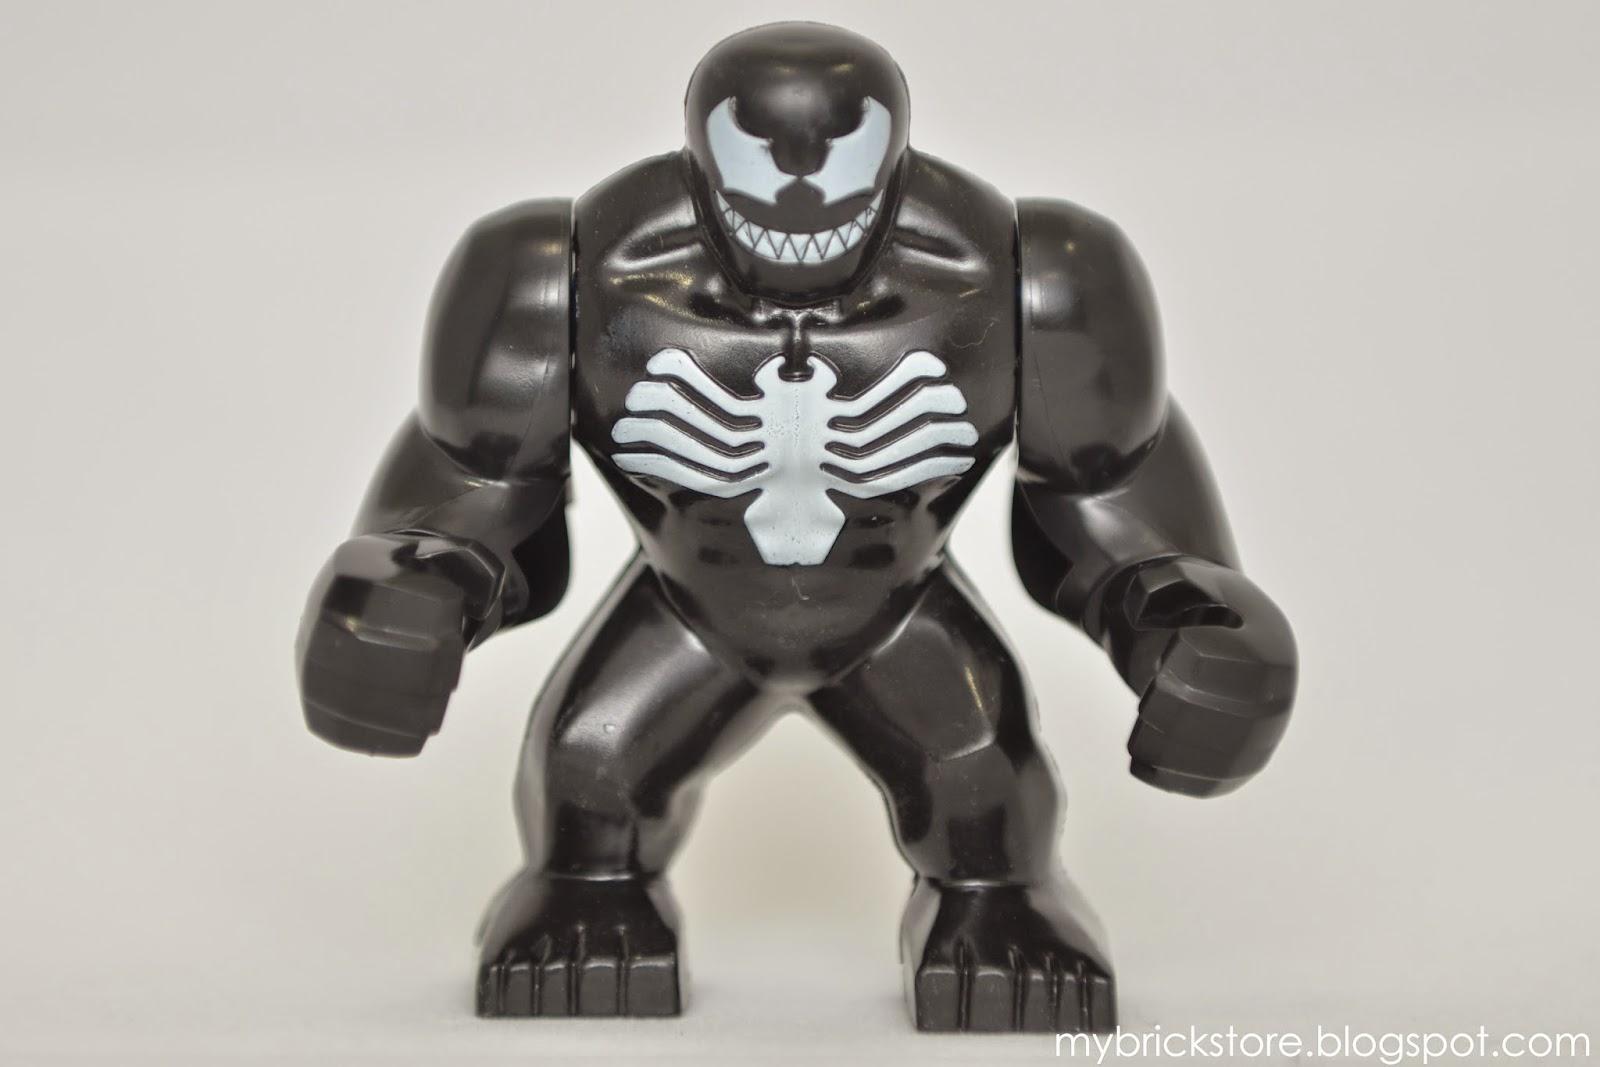 Venom Game Toy : My brick store lego venom big figure by decool